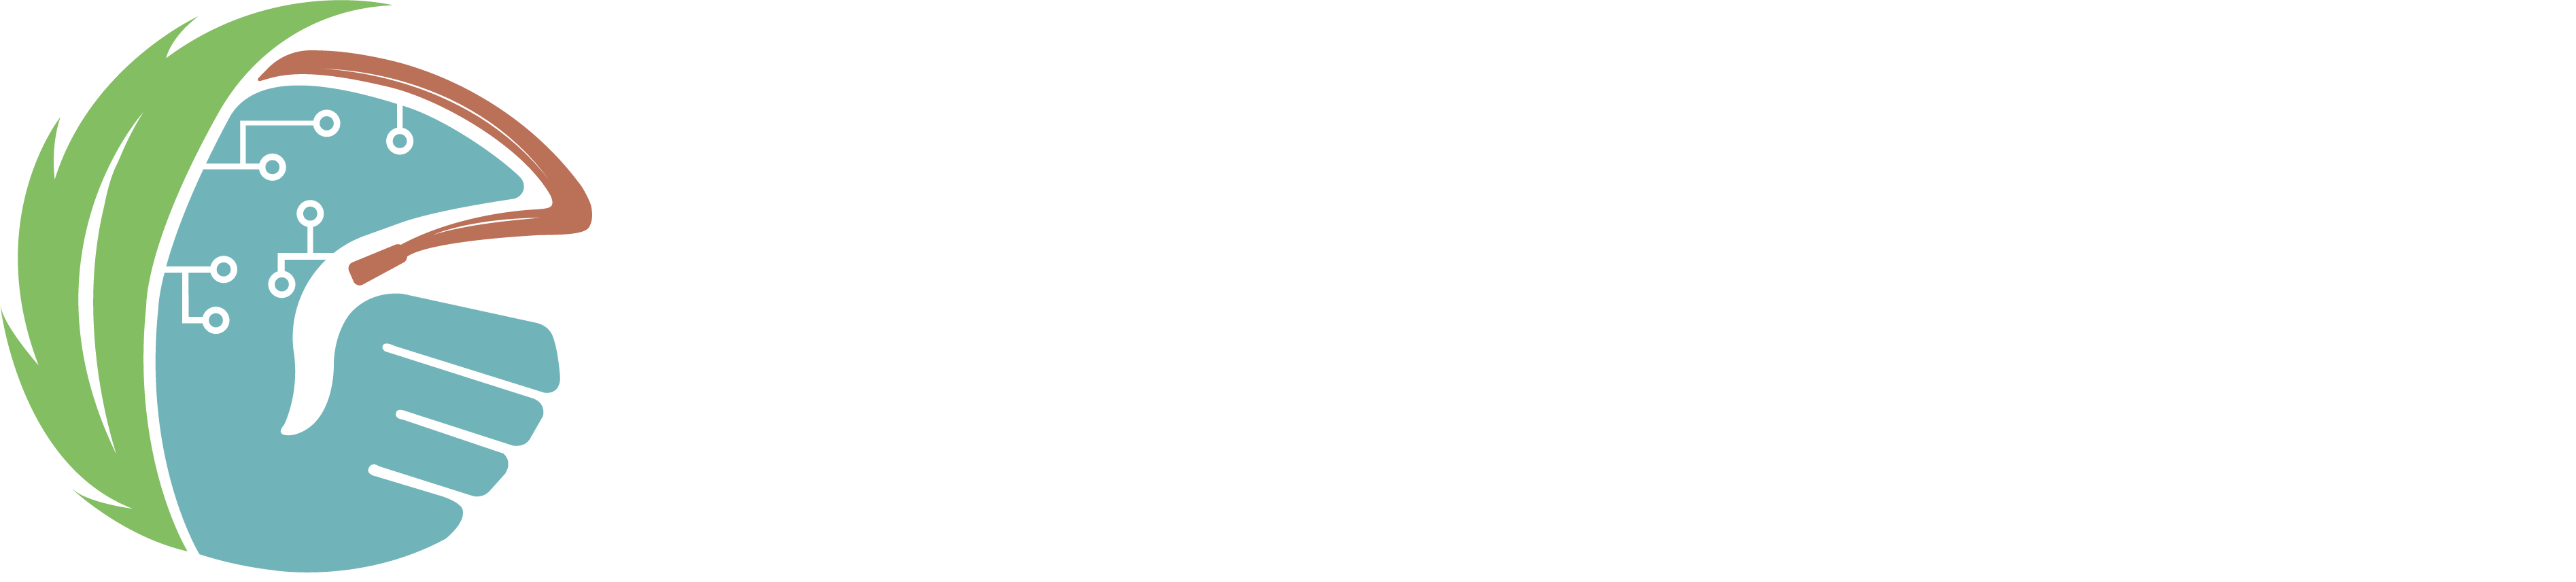 Techniekpact smart and sustainable